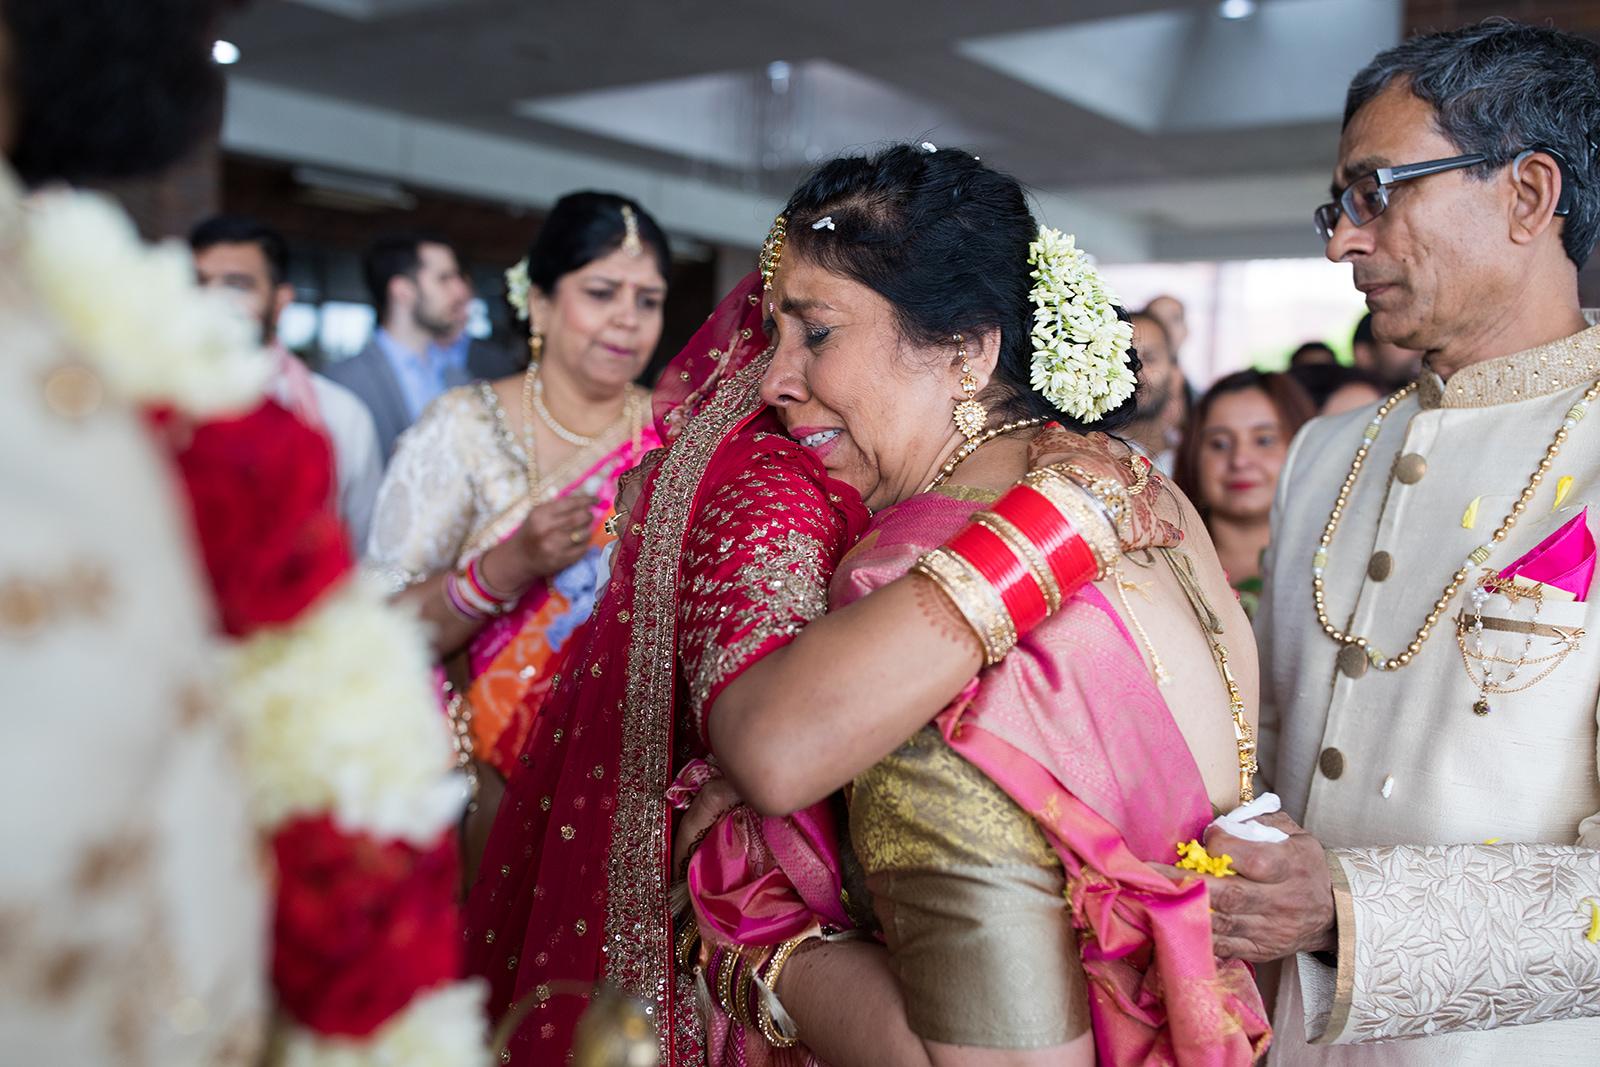 Le Cape Weddings - Sumeet and Chavi - Vidai --23.jpg